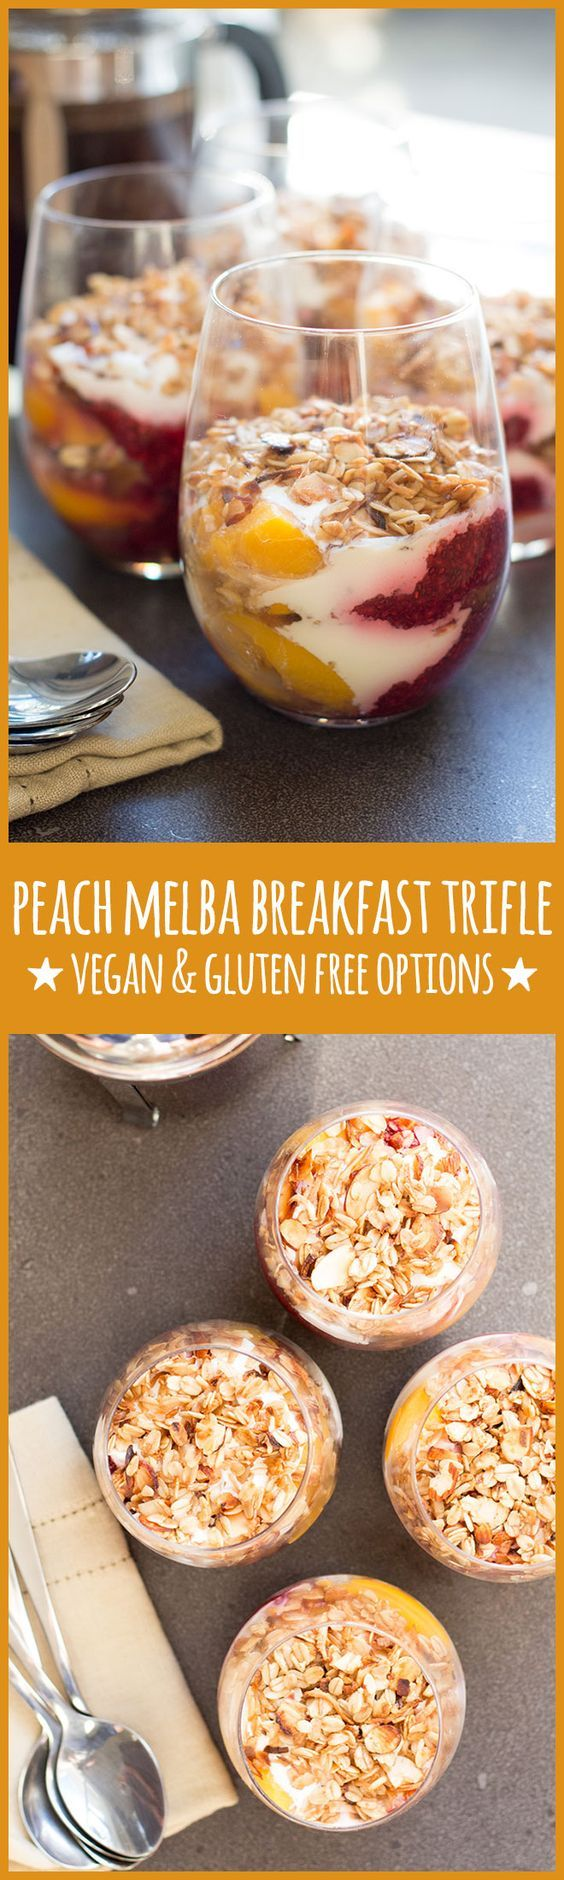 peach melba breakfast trifle